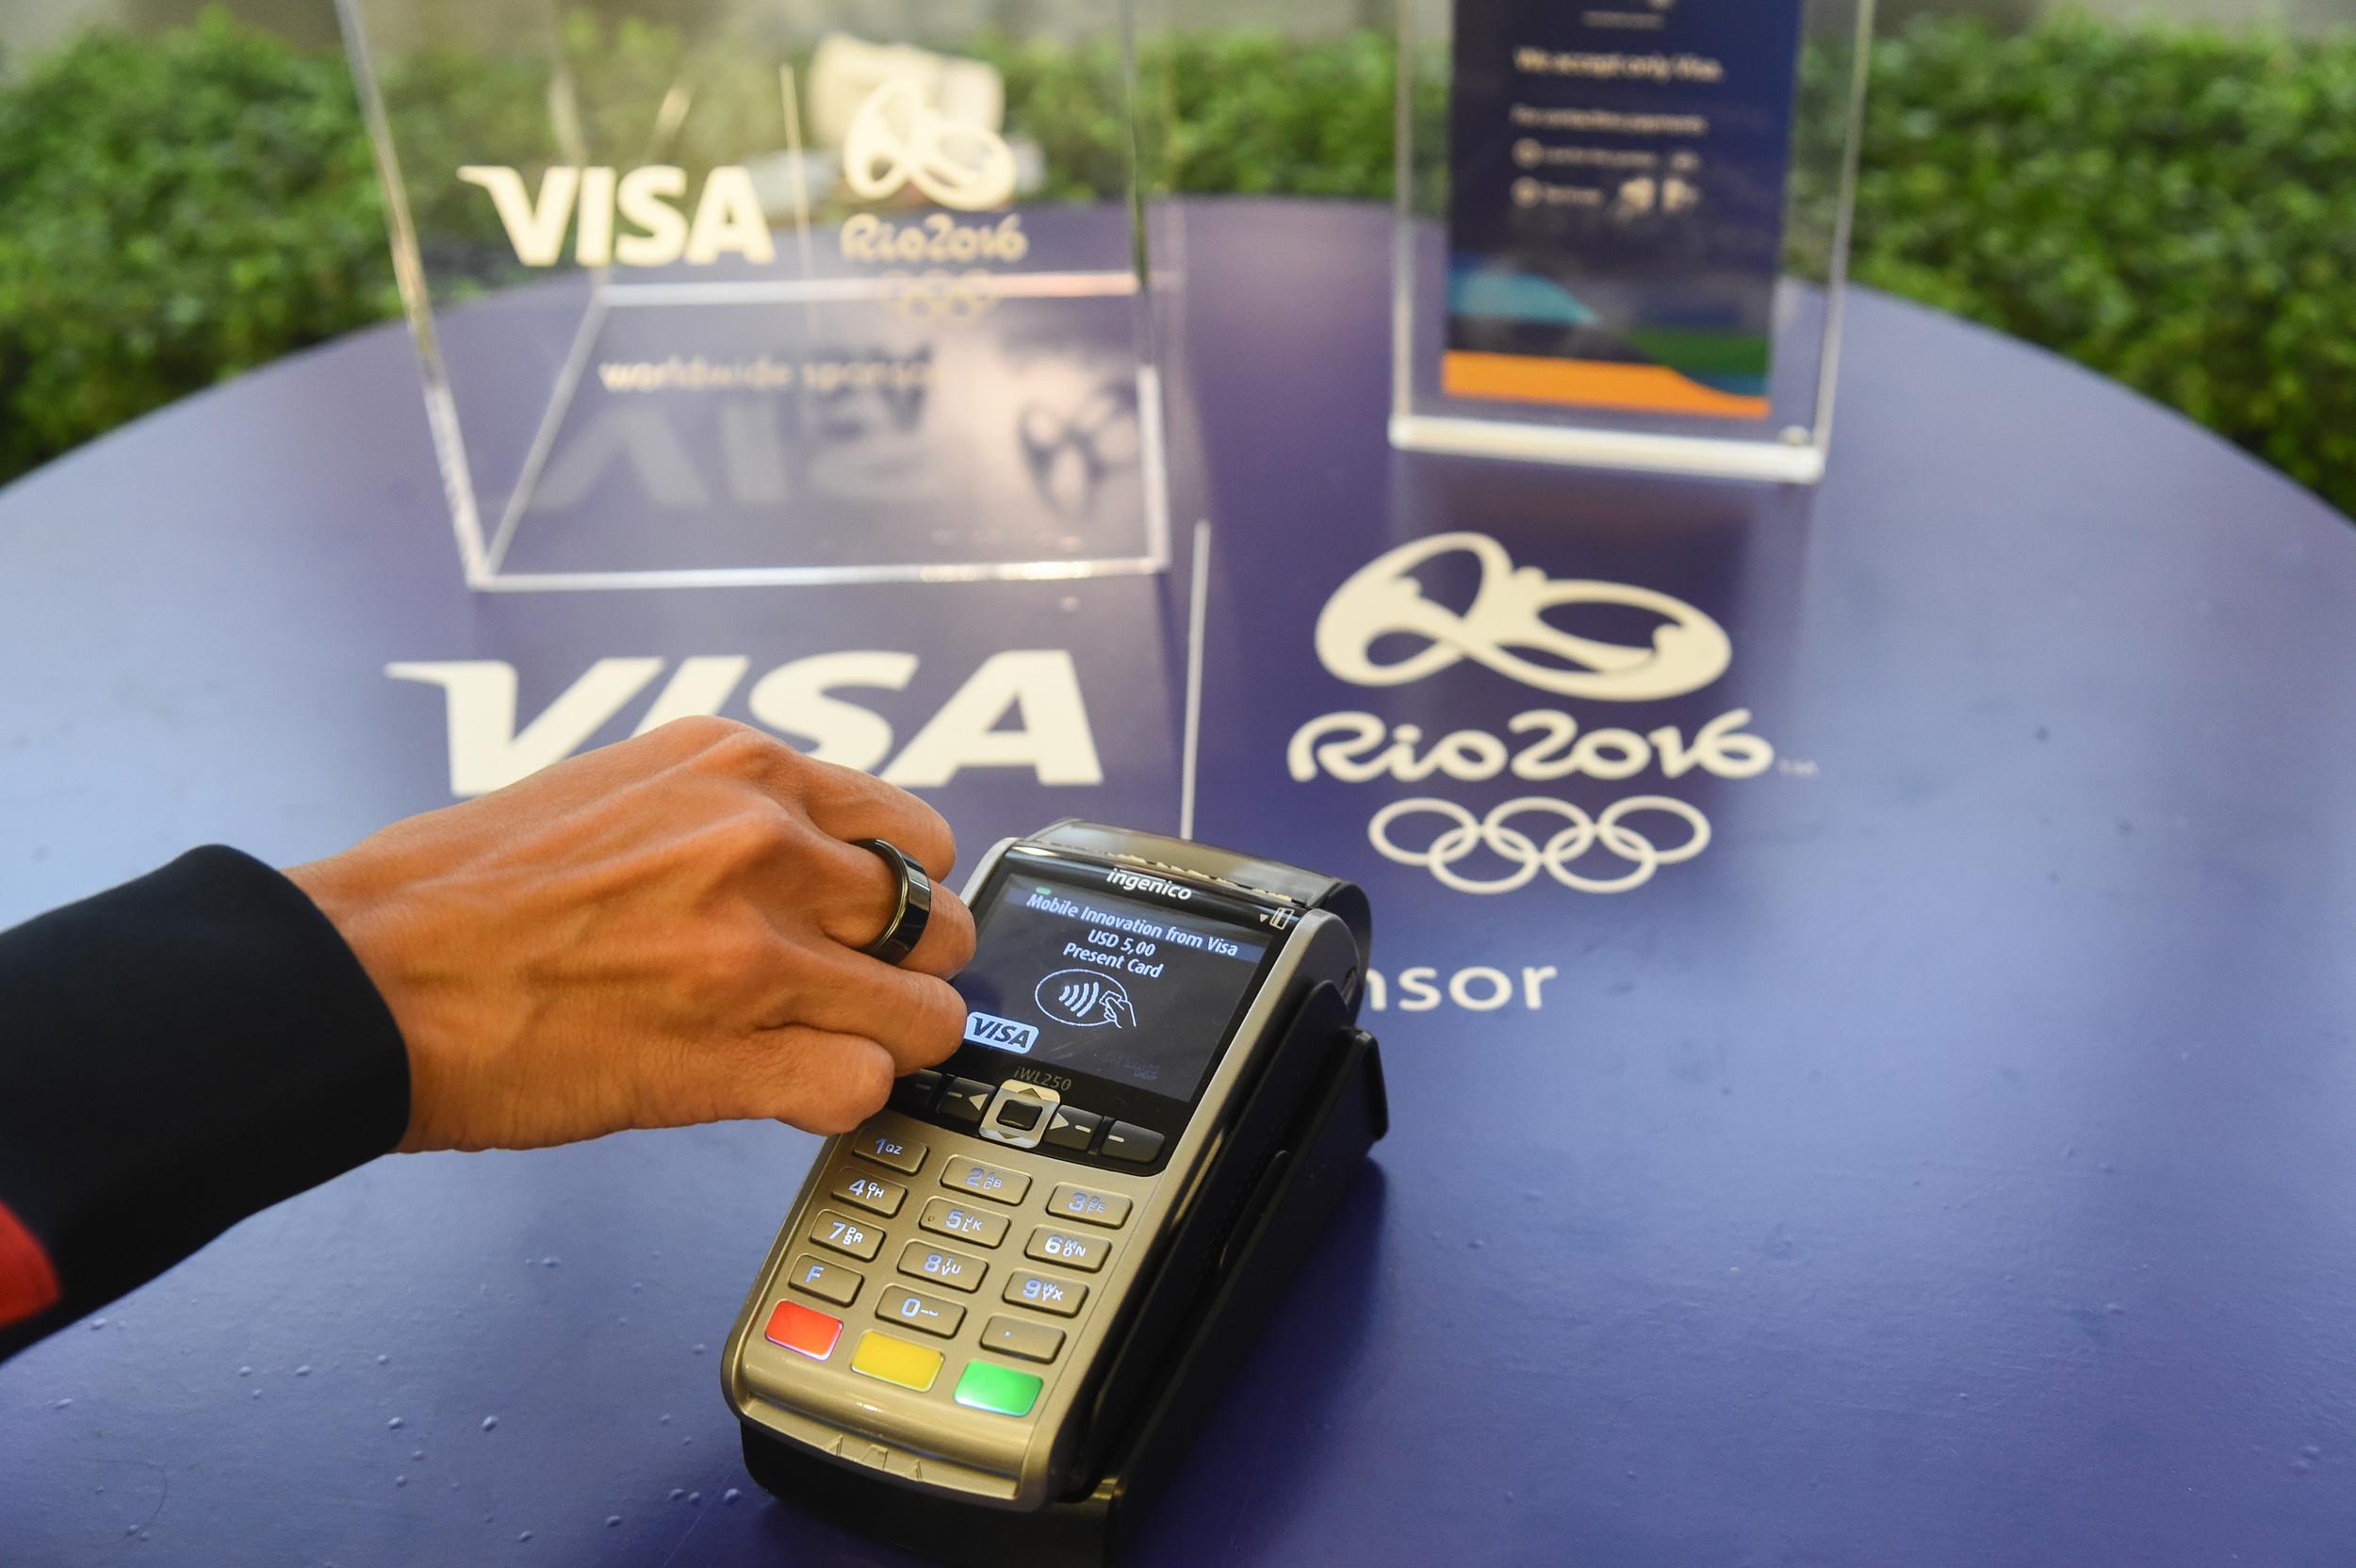 Photo Courtesy of Visa